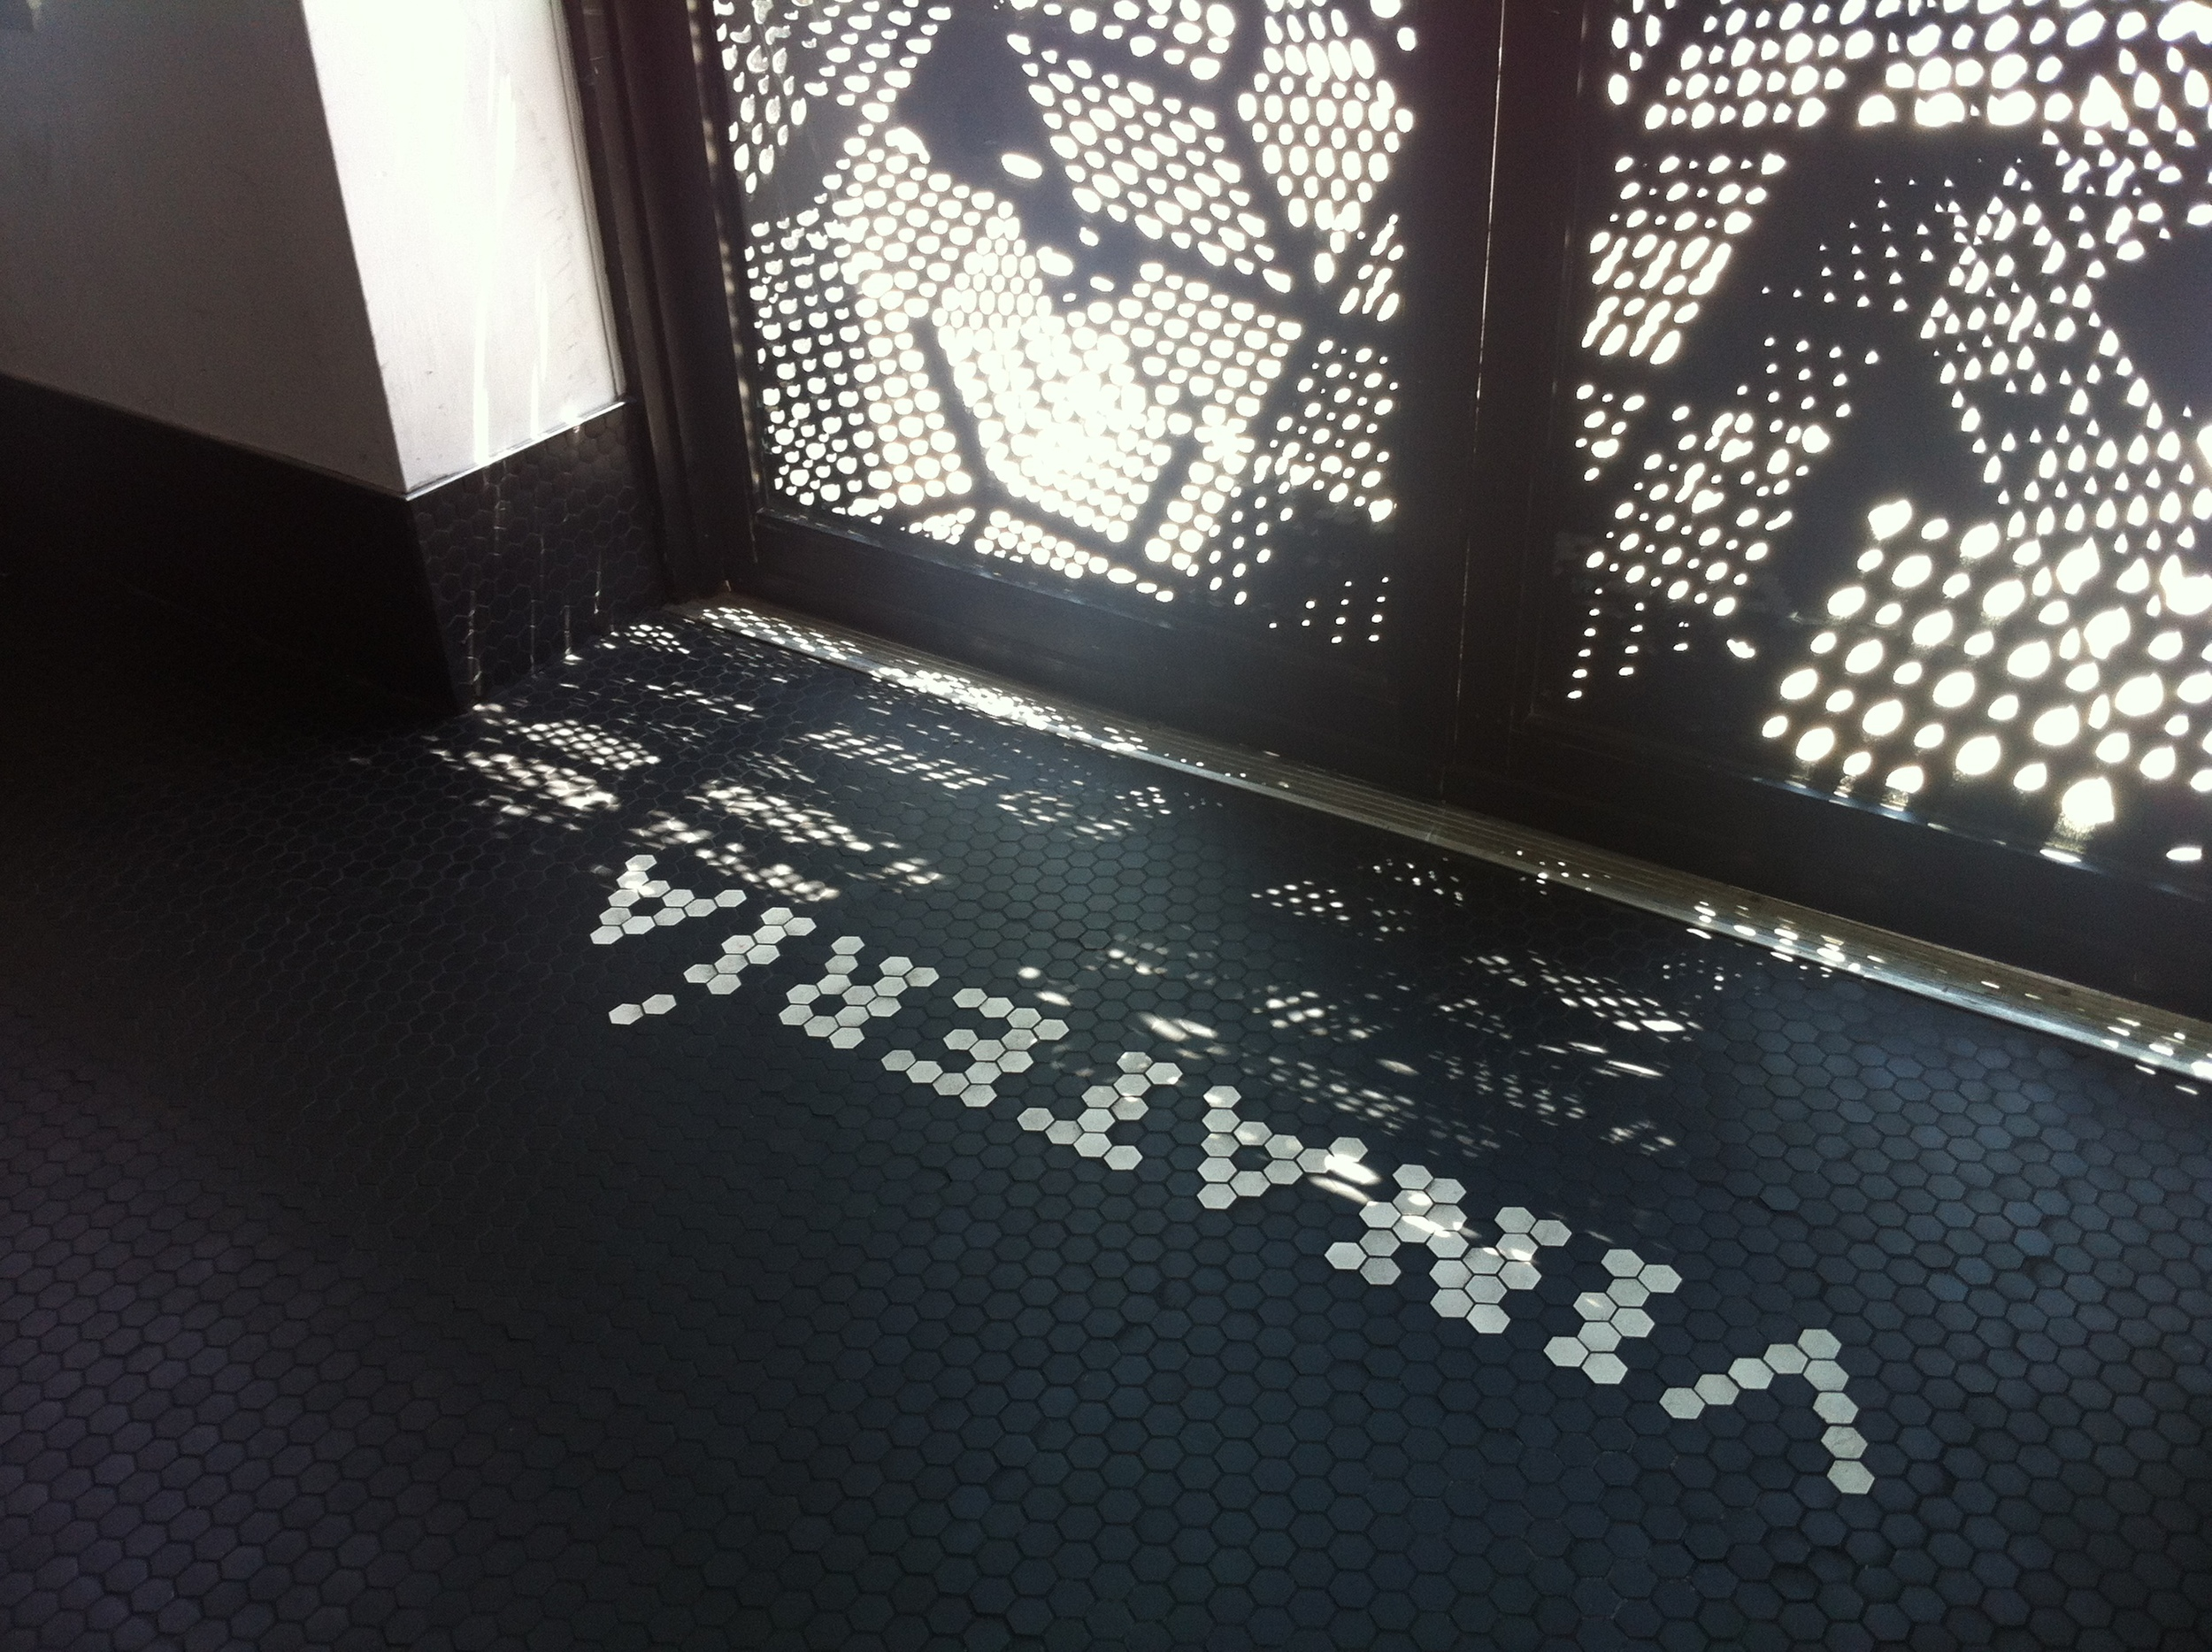 _floor tile signage.JPG